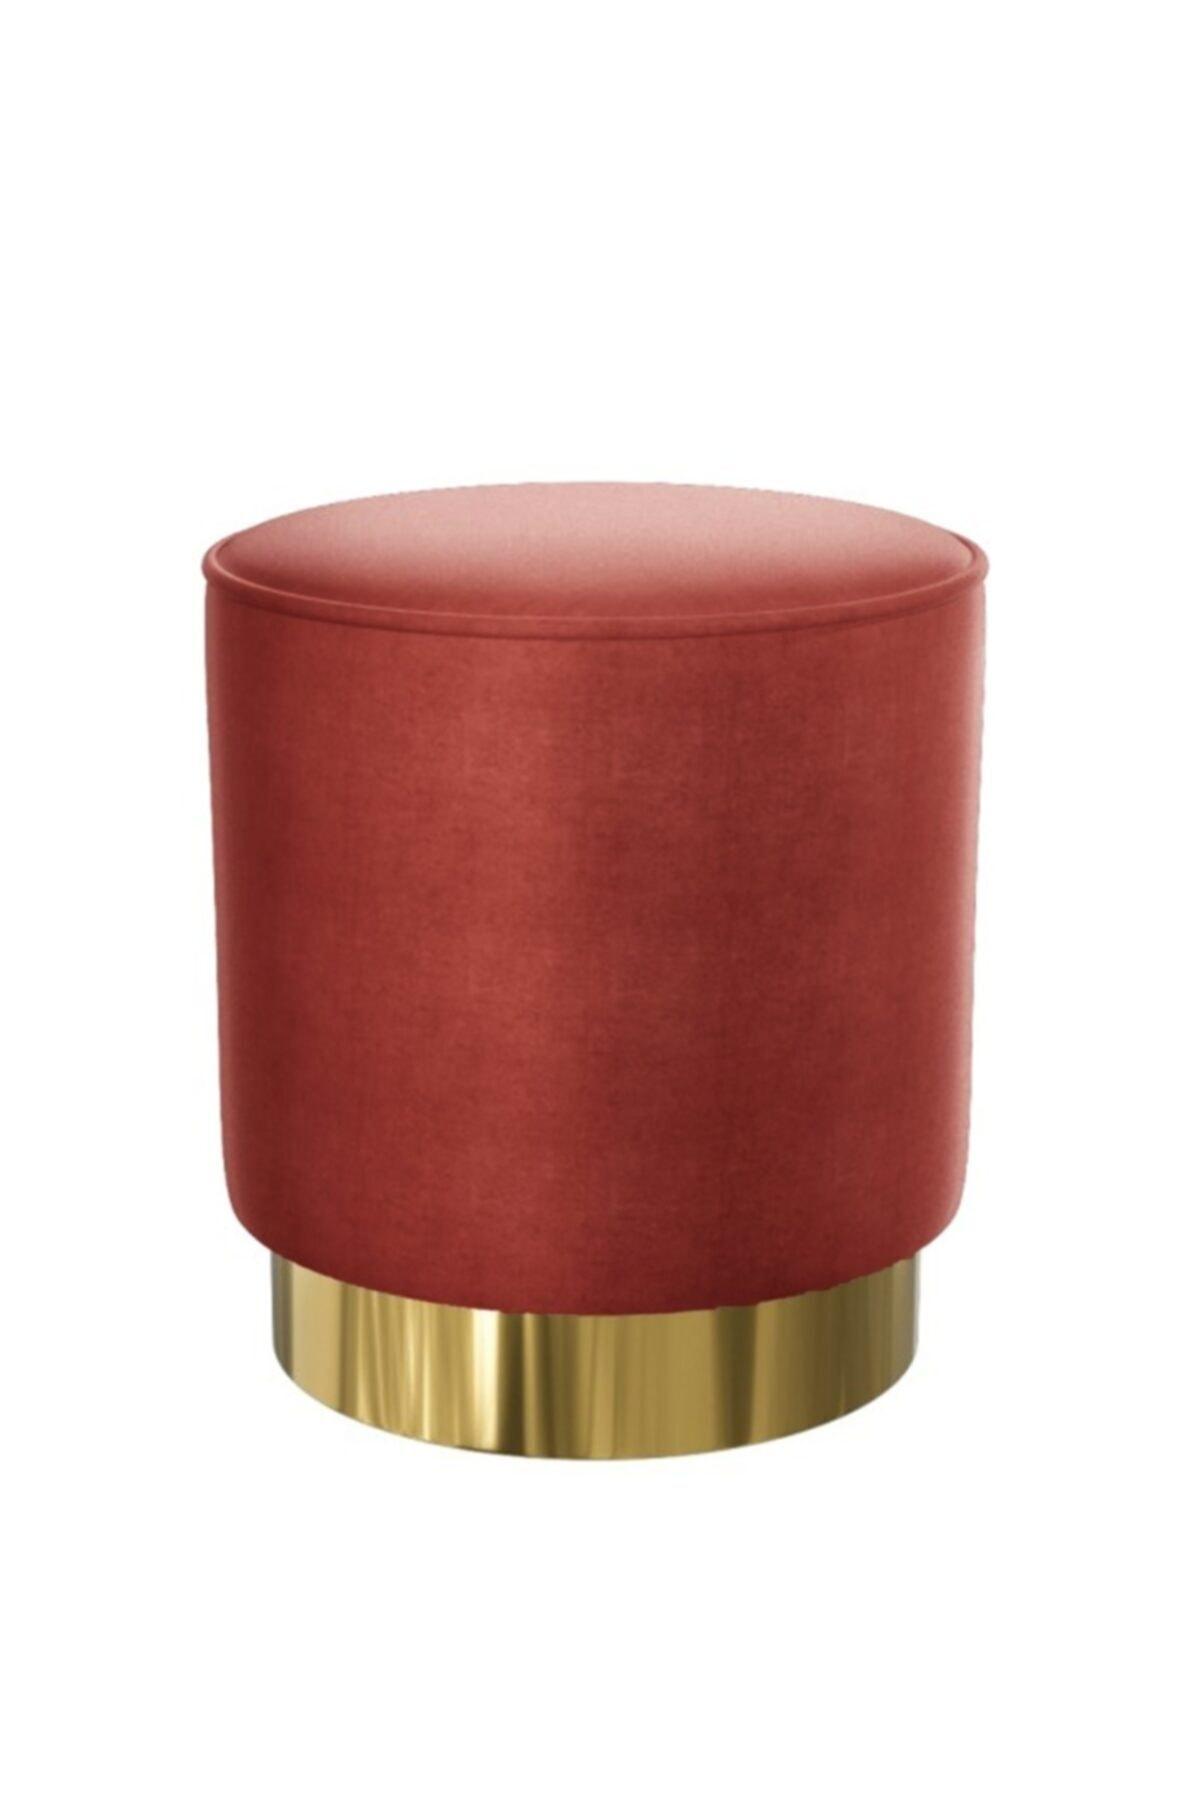 Zem Nora Silinebilir Puf - Red Gold 2